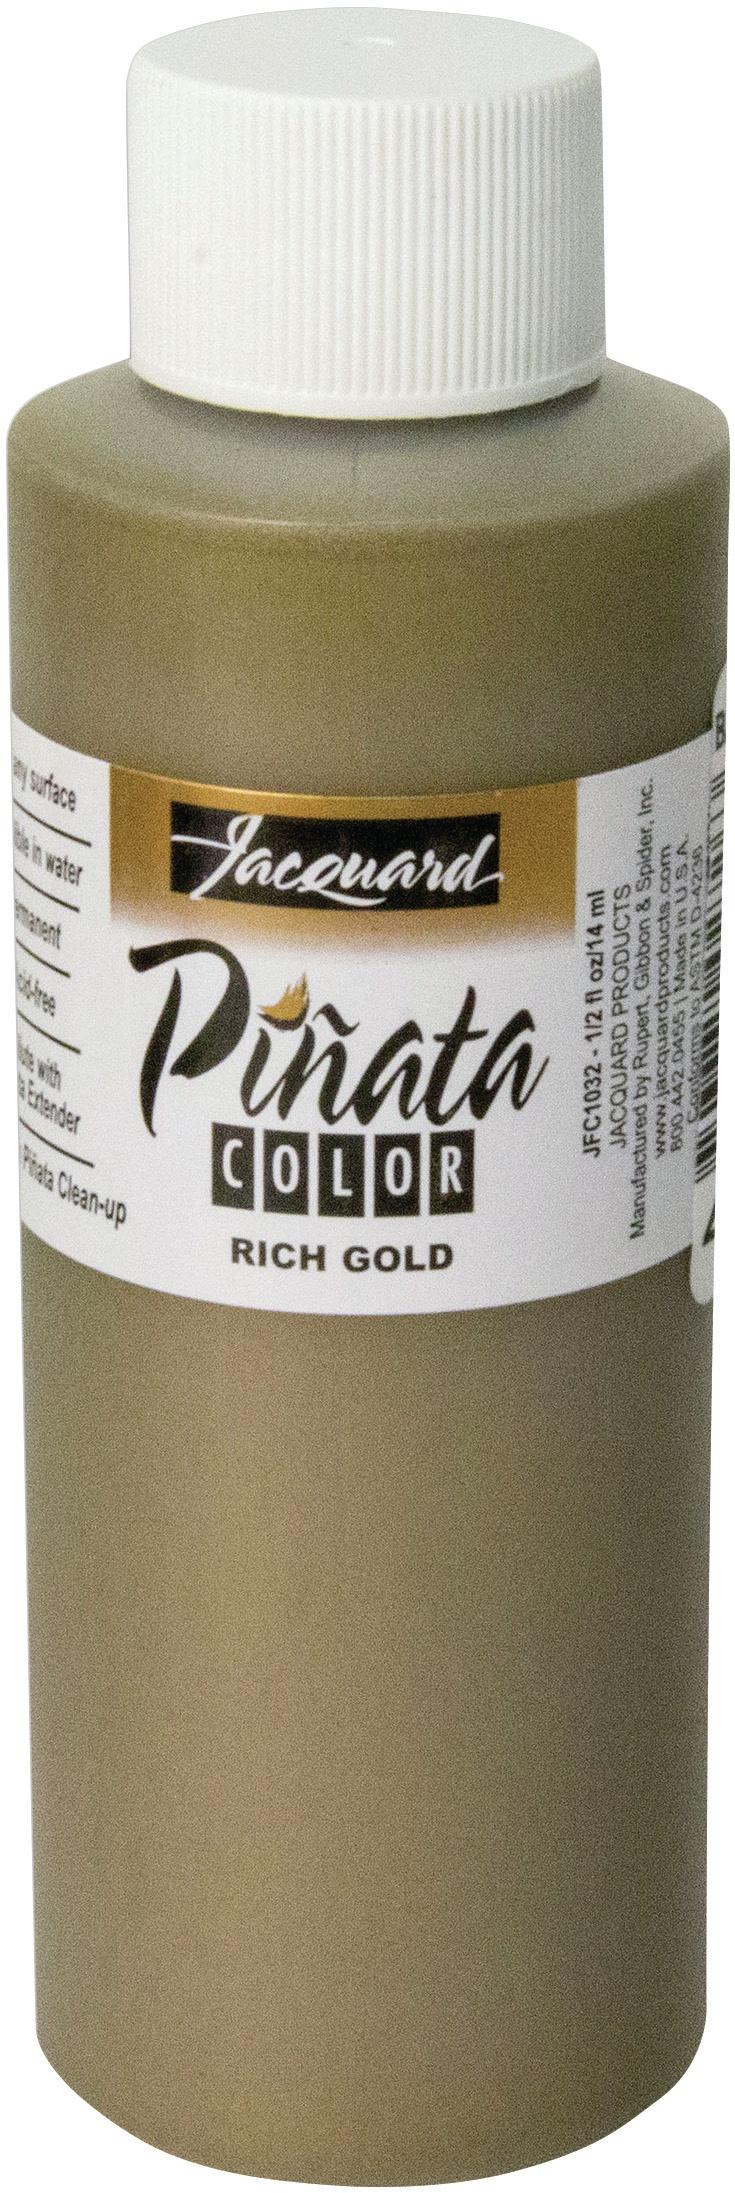 Jacquard Pinata Color Alcohol Ink 4oz - 22 Colors Available